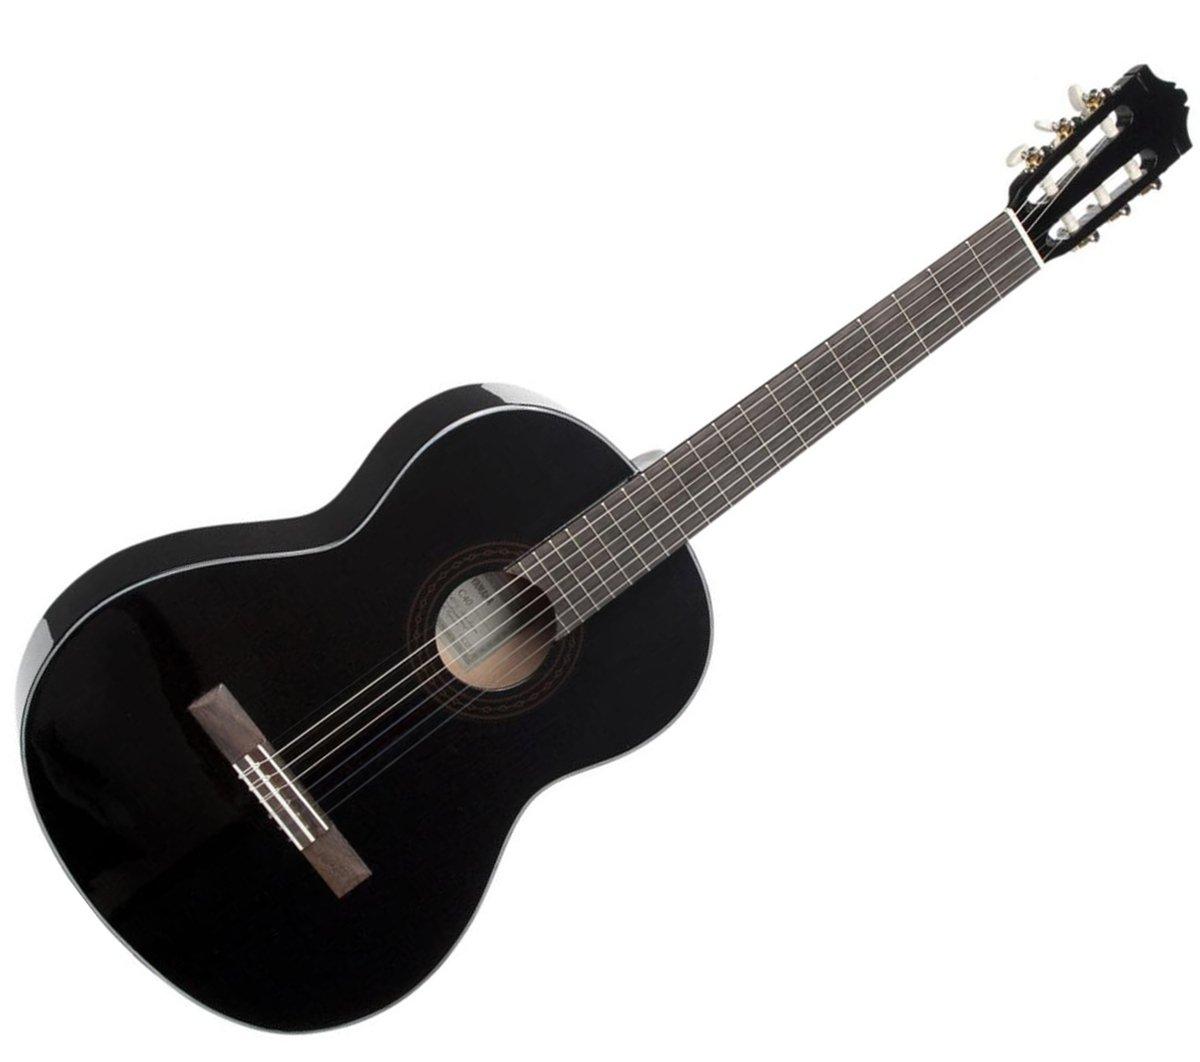 yamaha c40 bl rozmiar 4 4 klasyczne gitary i basy. Black Bedroom Furniture Sets. Home Design Ideas